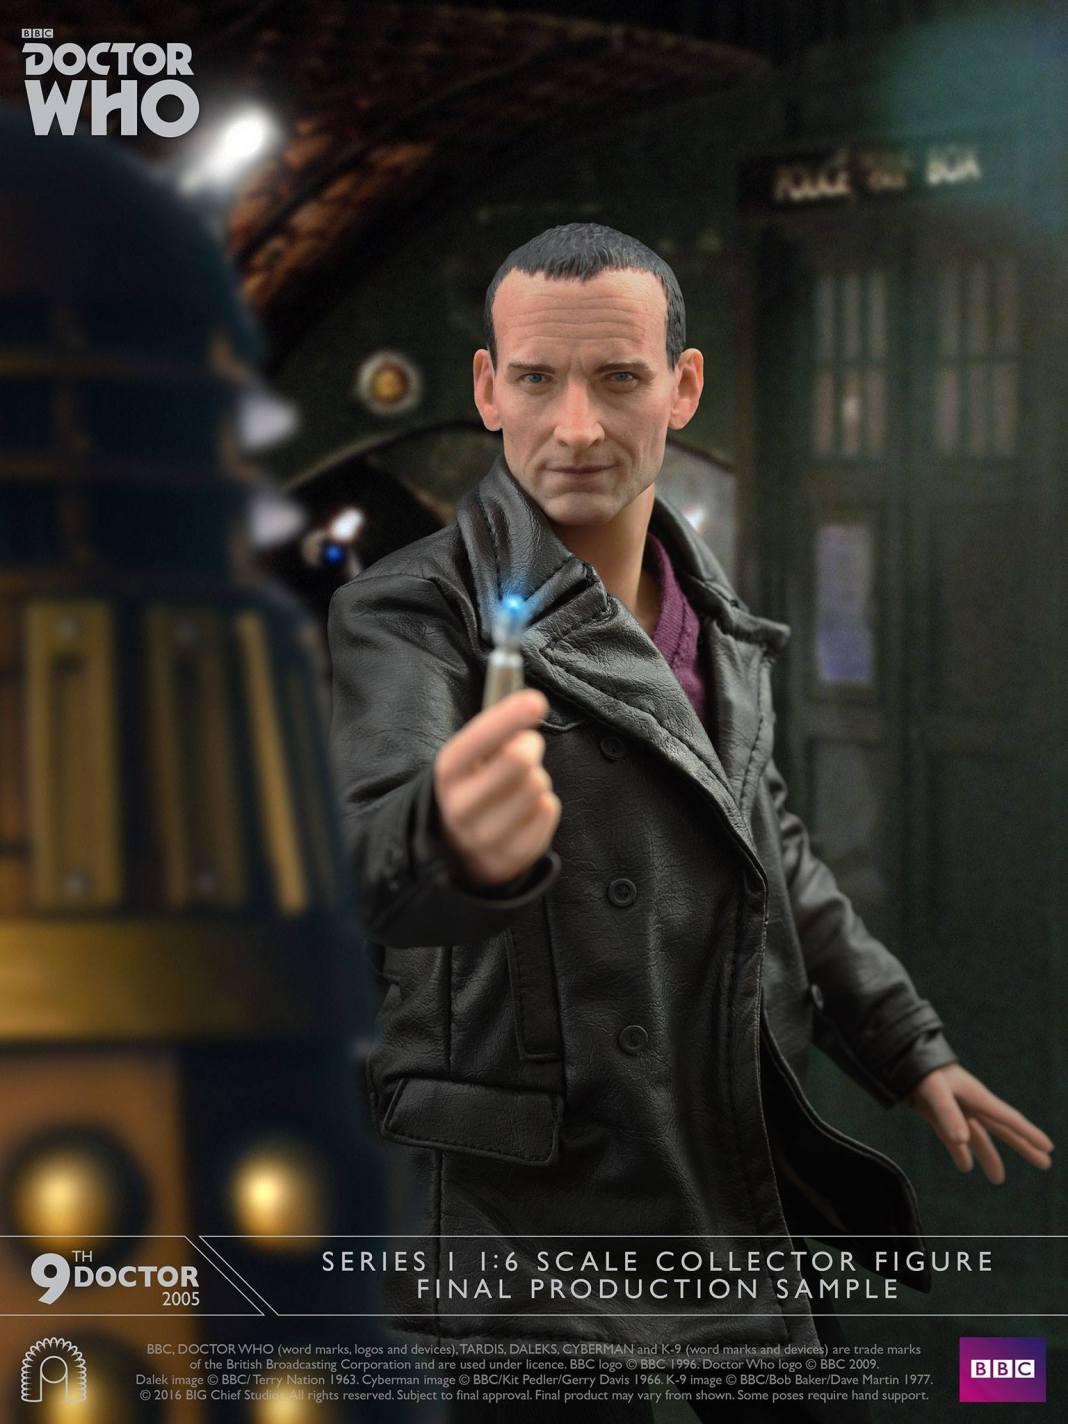 9th Doctor Series 1 - 1:6 Scale Figurine (c) Big Chief Studios